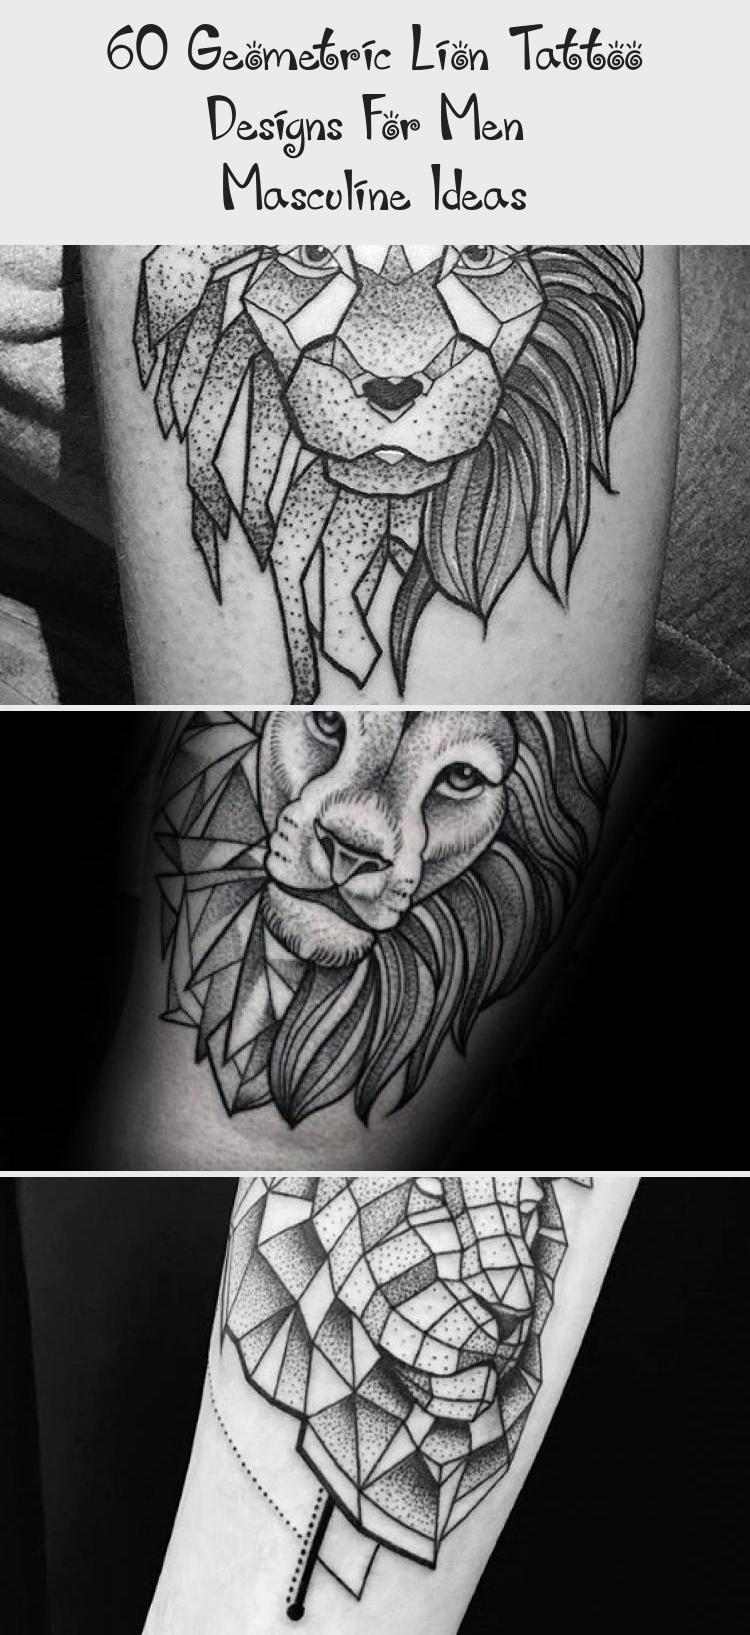 60 Geometric Lion Tattoo Designs For Men  Masculine Ideas  Tattoo Blog  Upper Chest Broken Geometric Lion Tattoo On Men